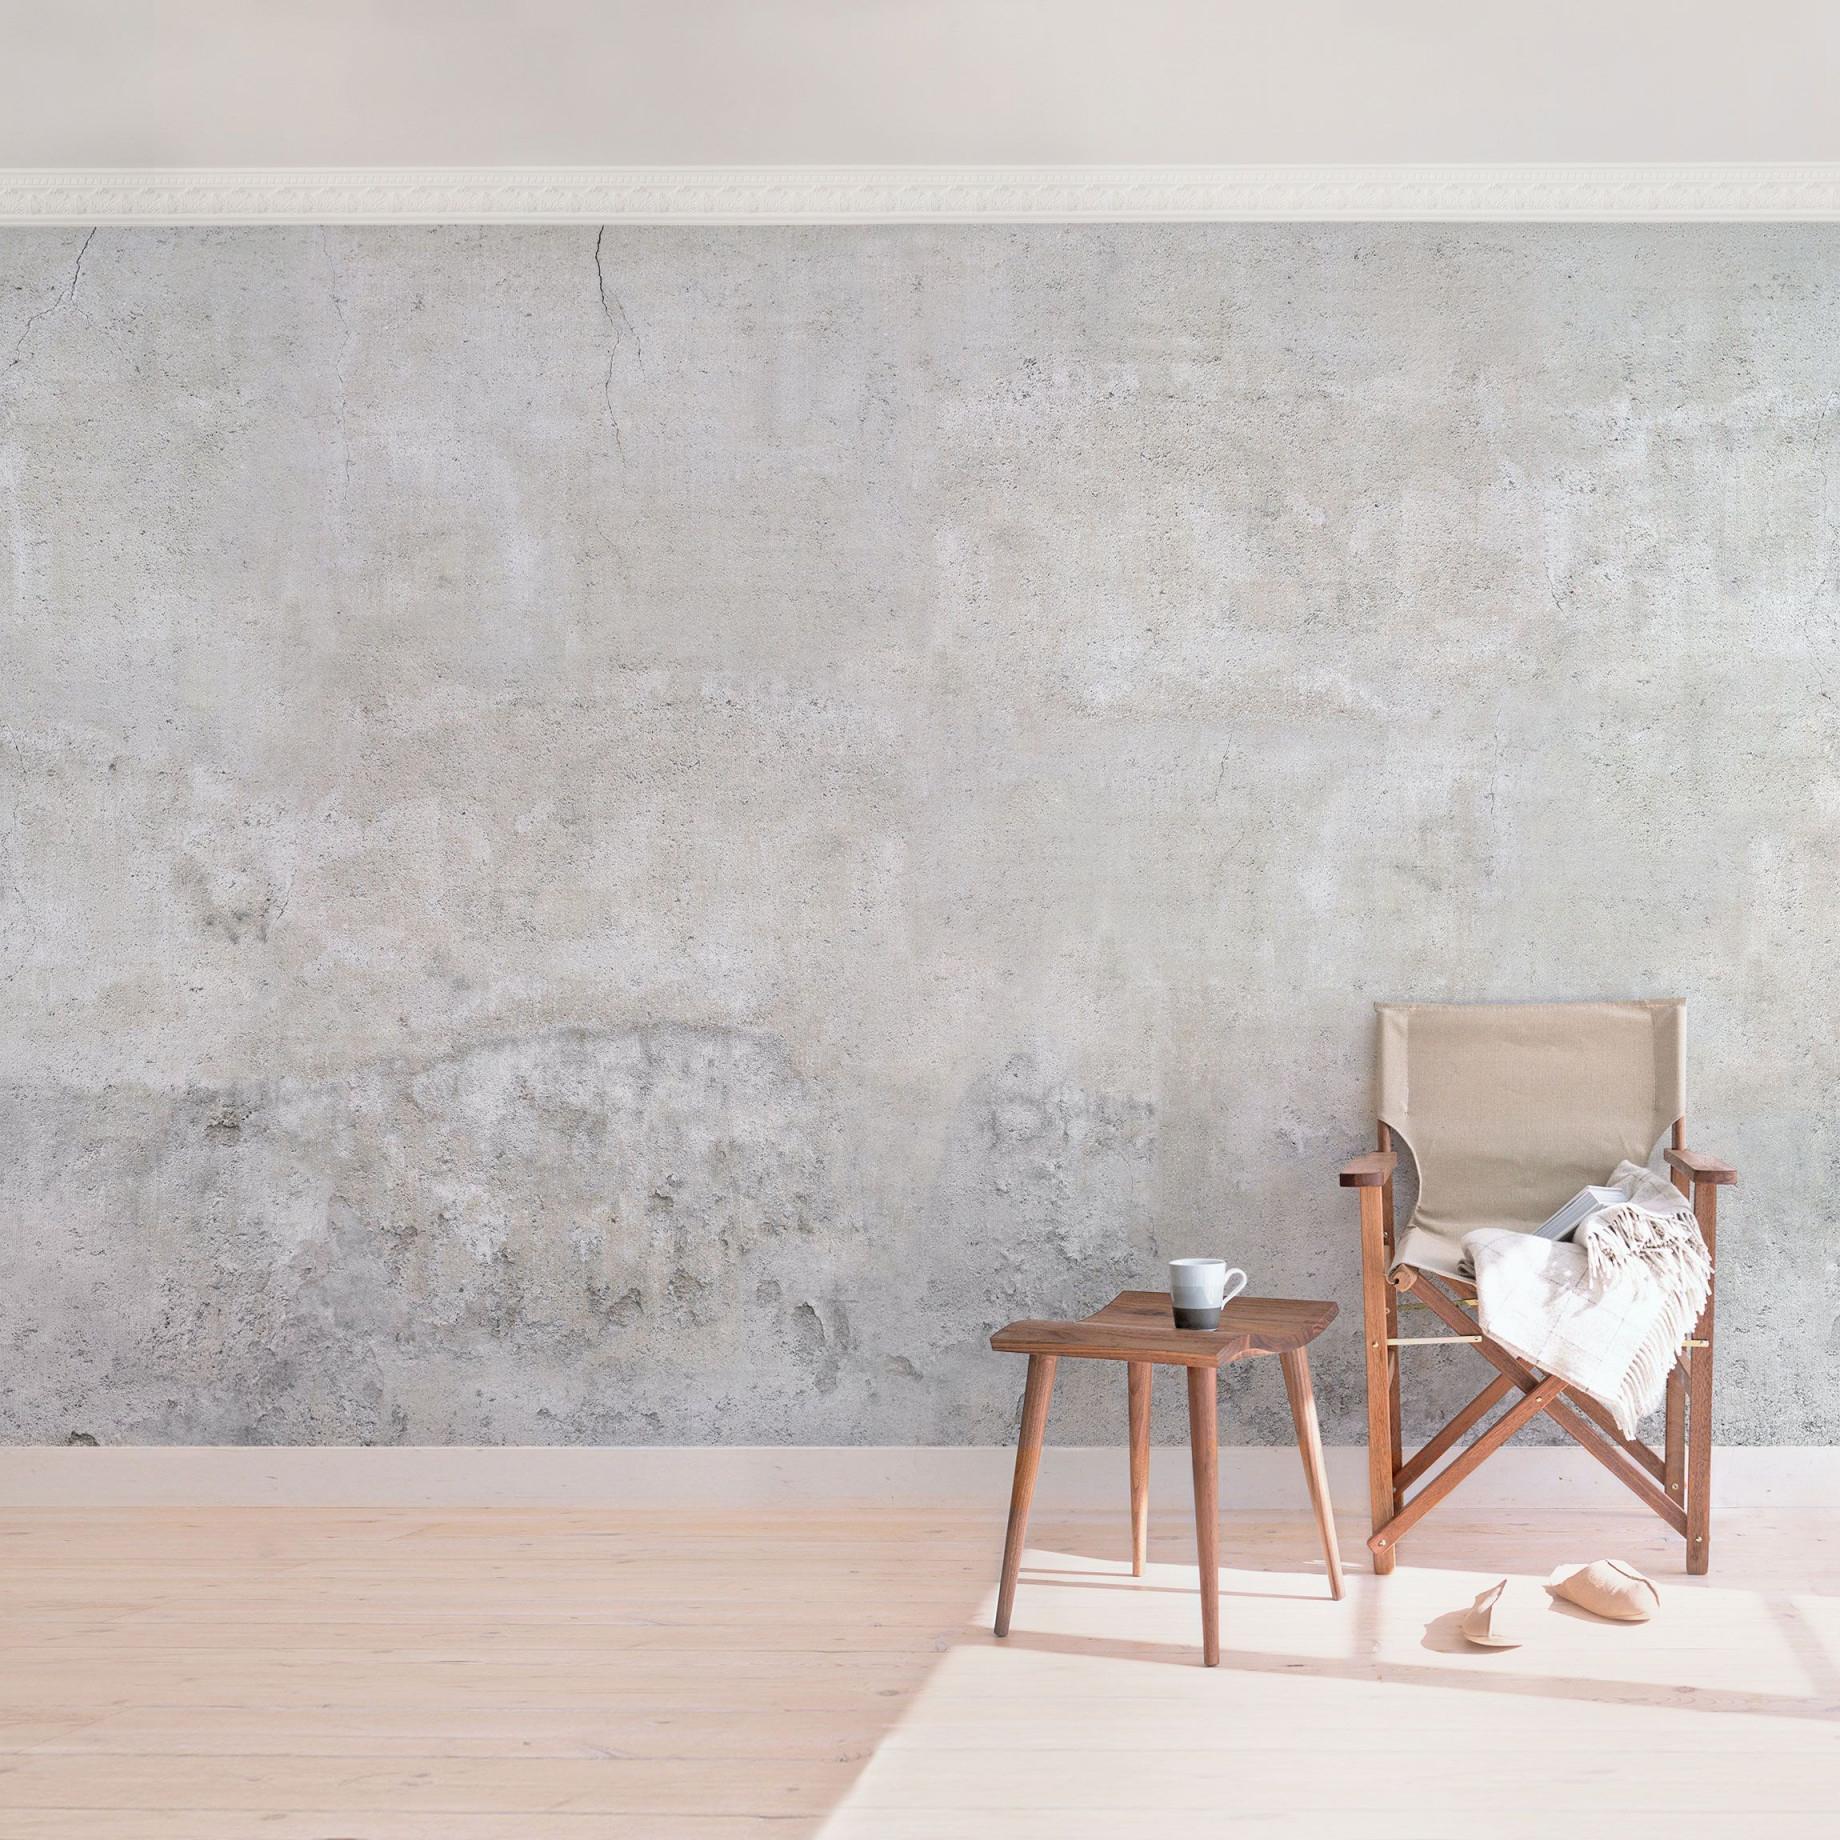 Betontapete  Shabby Betonoptik Tapete  Vliestapete Breit von Tapeten Design Wohnzimmer Bild